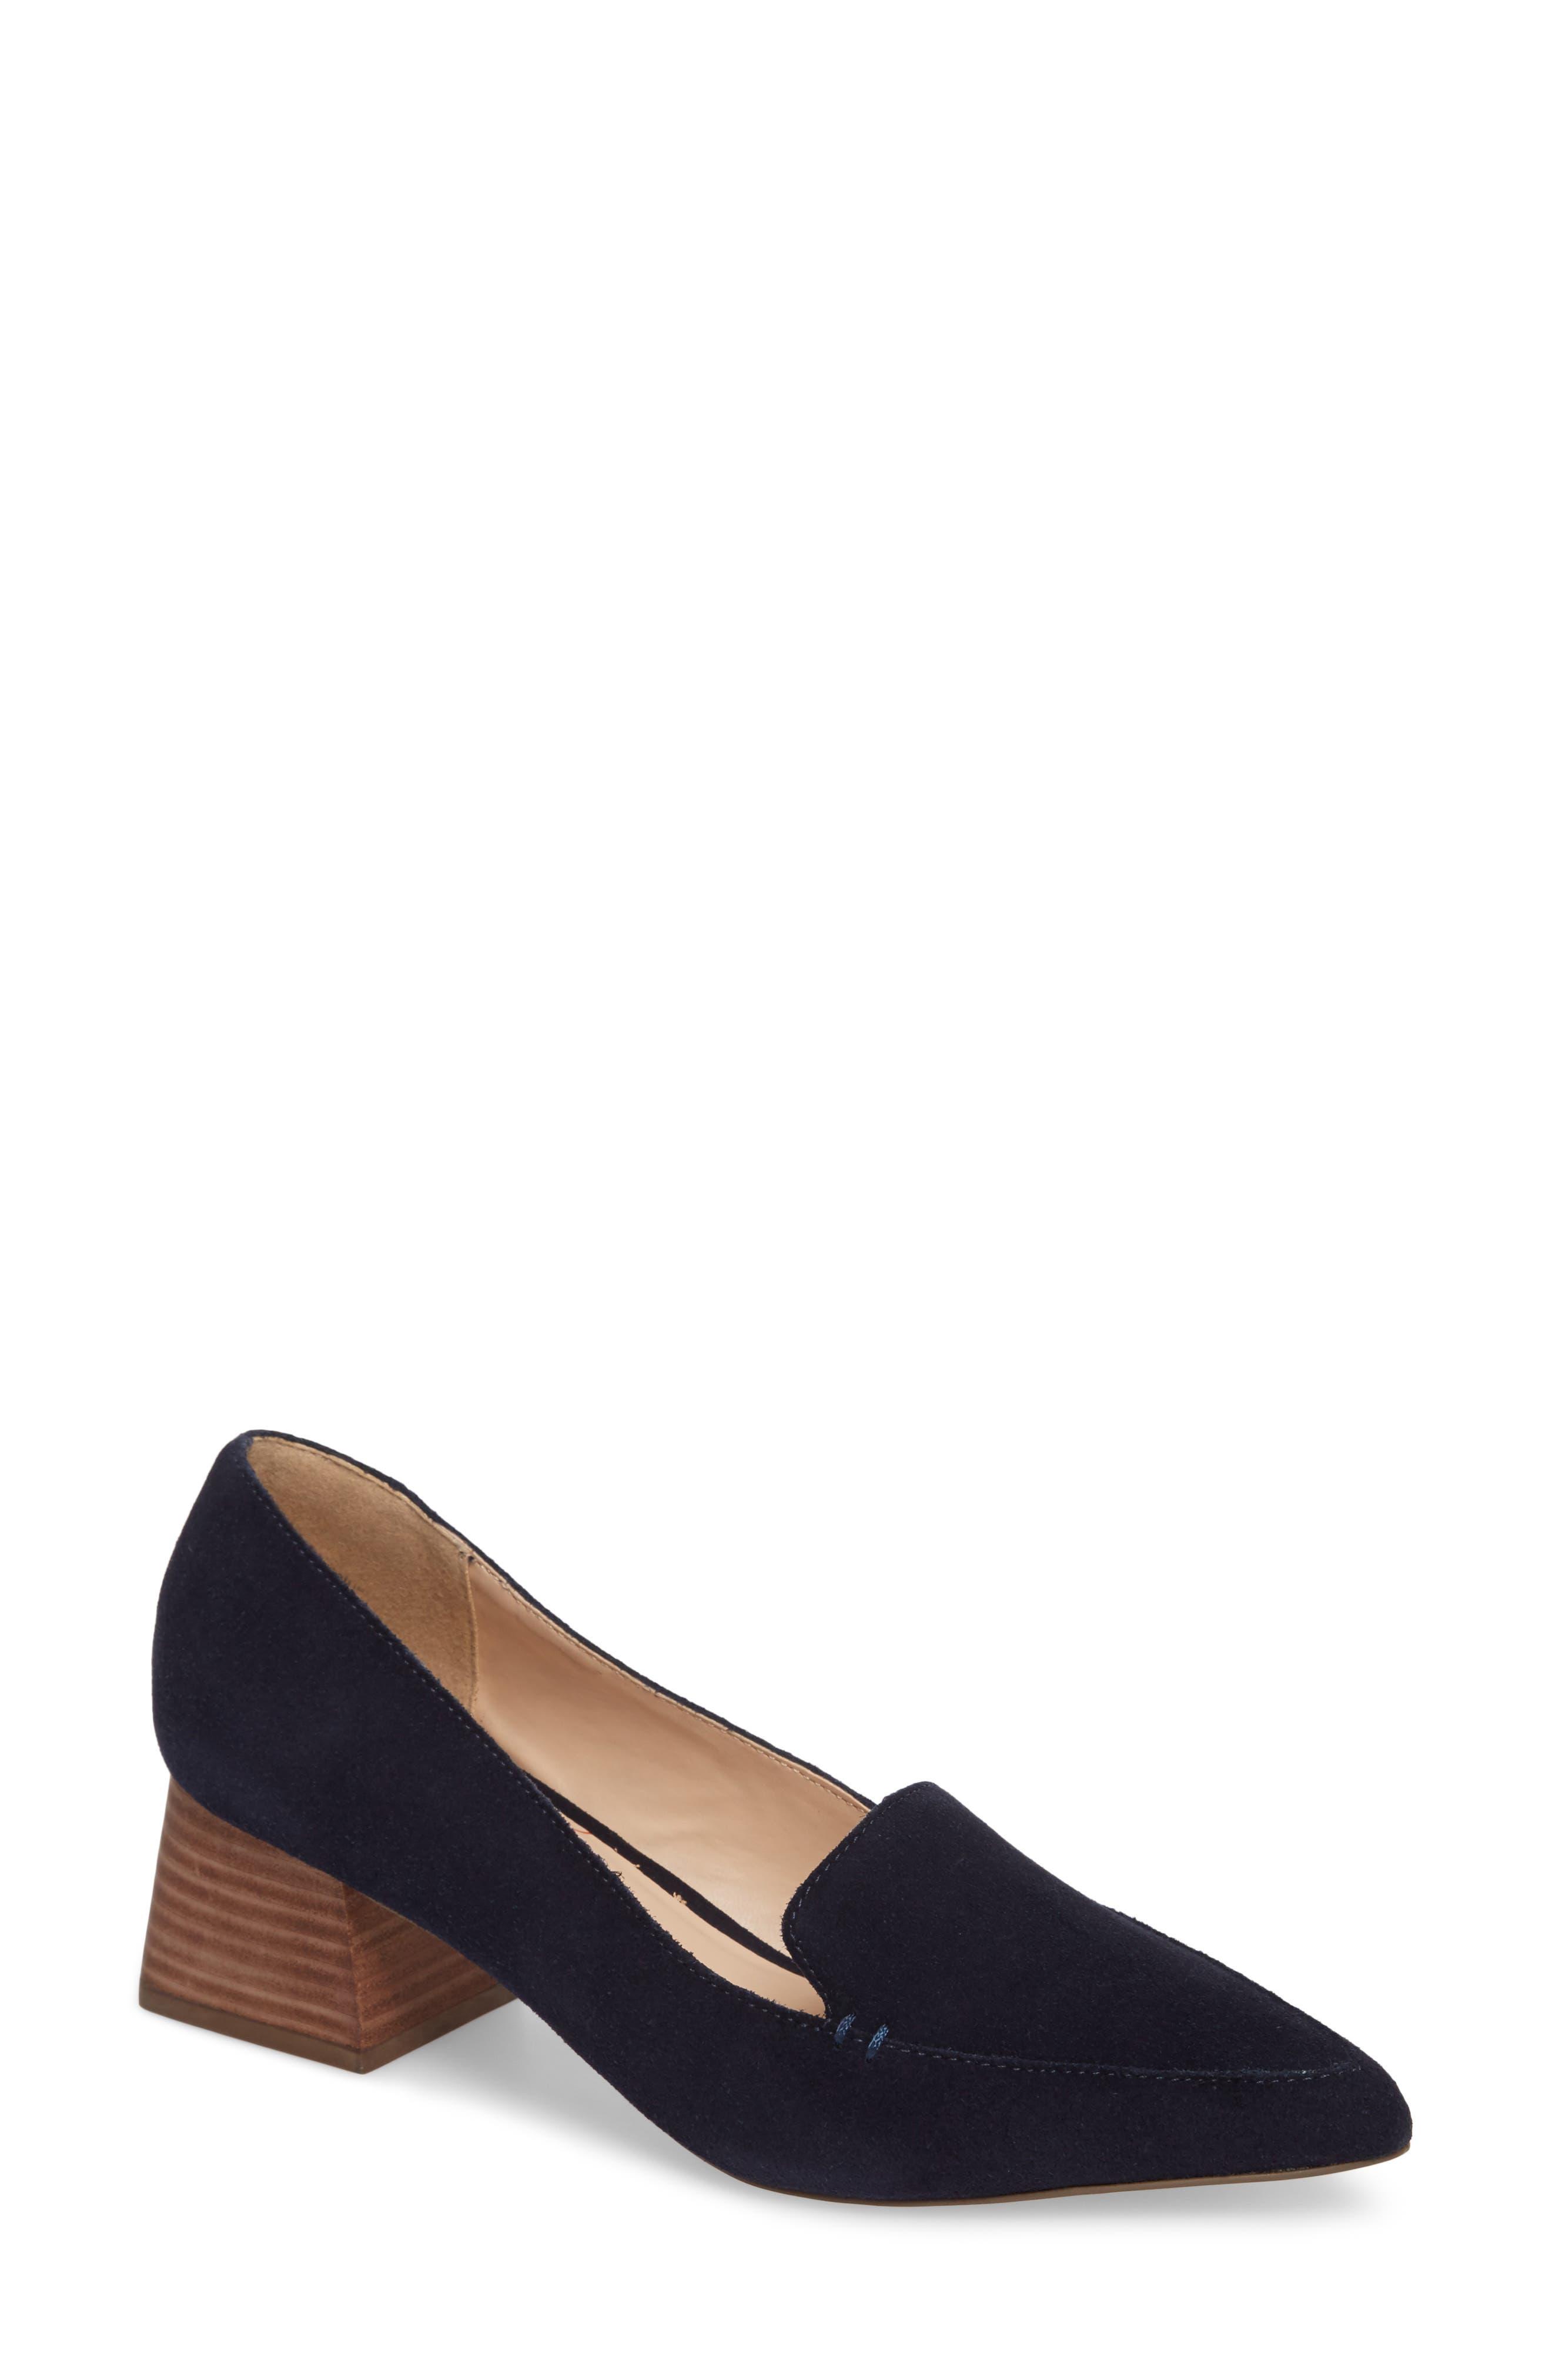 SOLE SOCIETY Mavis Flare Heel Loafer, Main, color, OMBRE BLUE